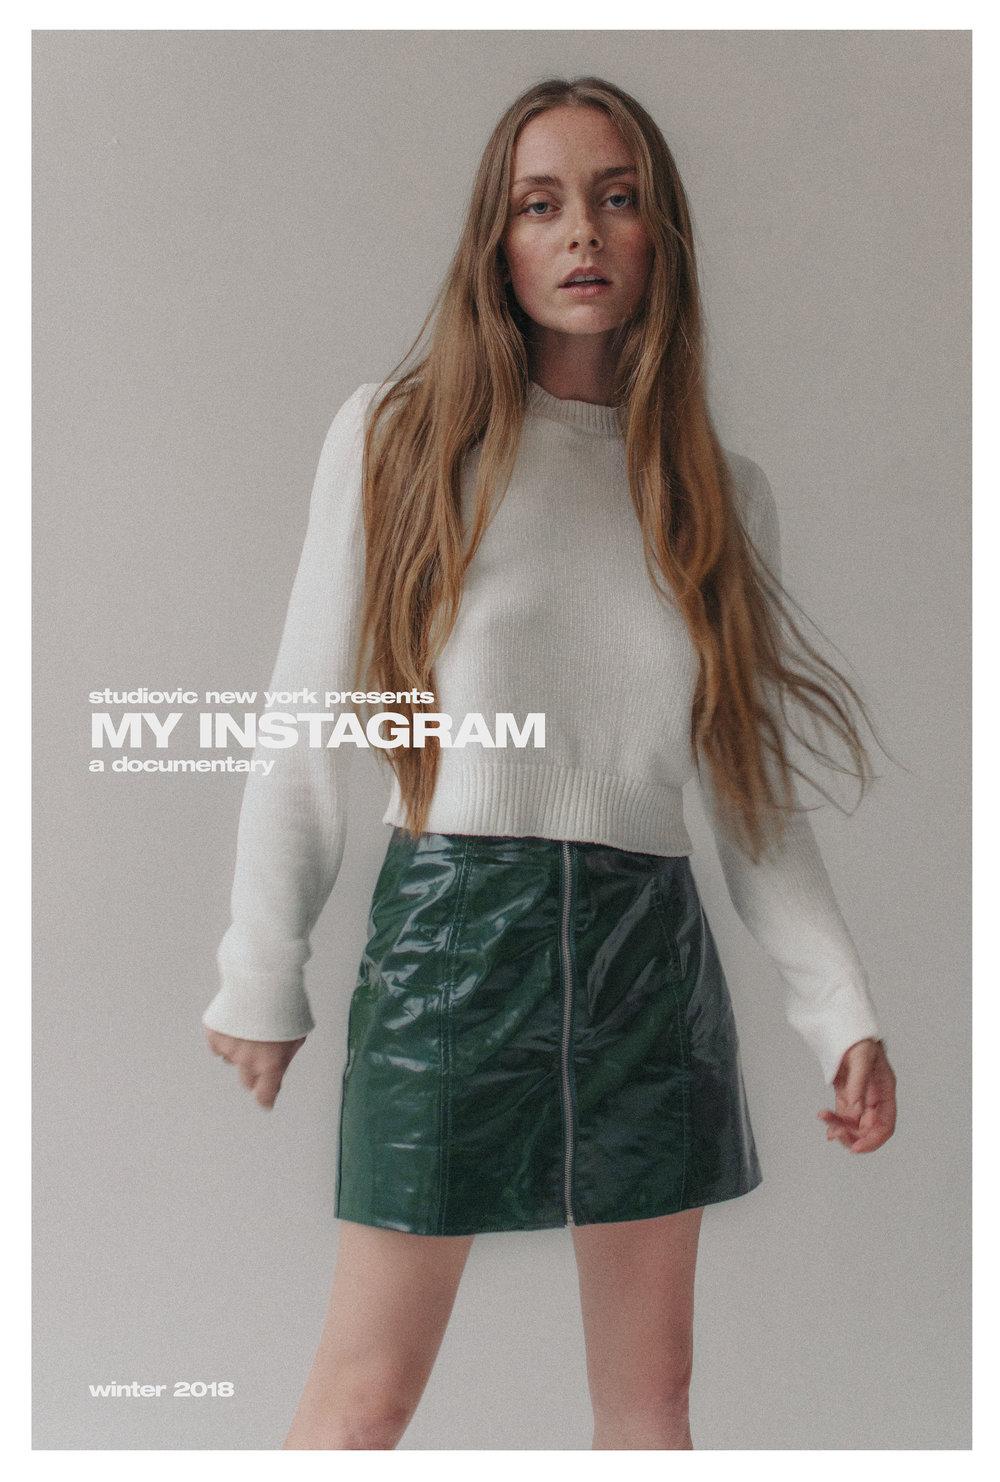 My Instagram Poster 2.jpg